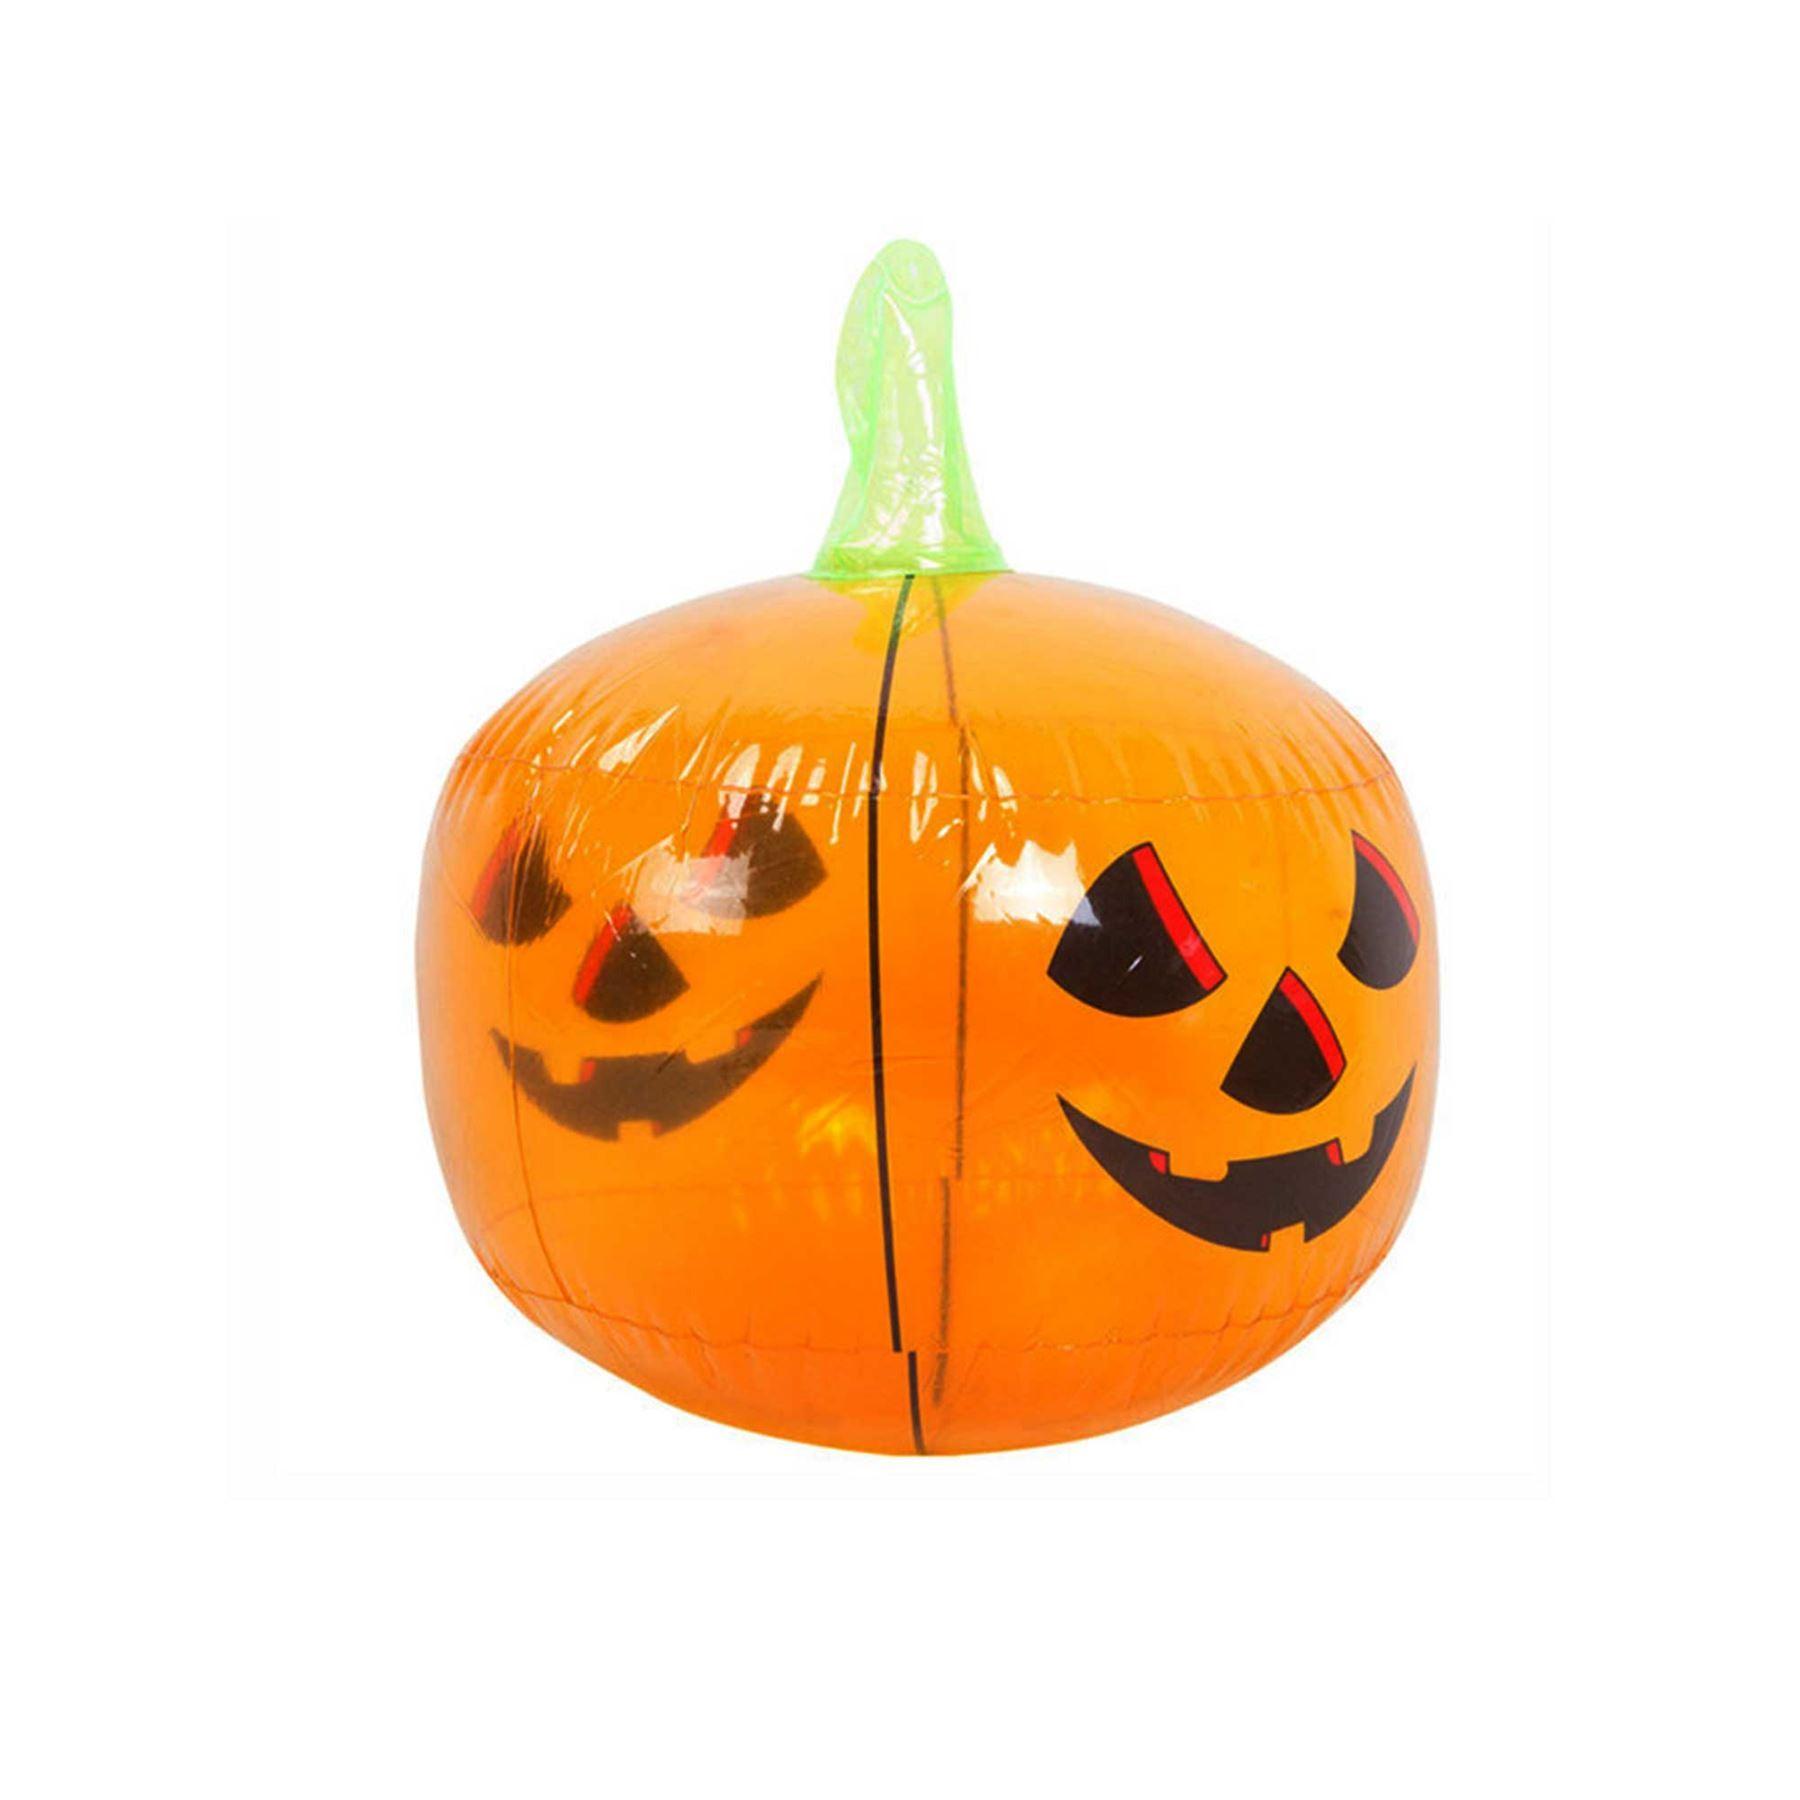 Halloween inflatable decorations pumpkins skeleton spider